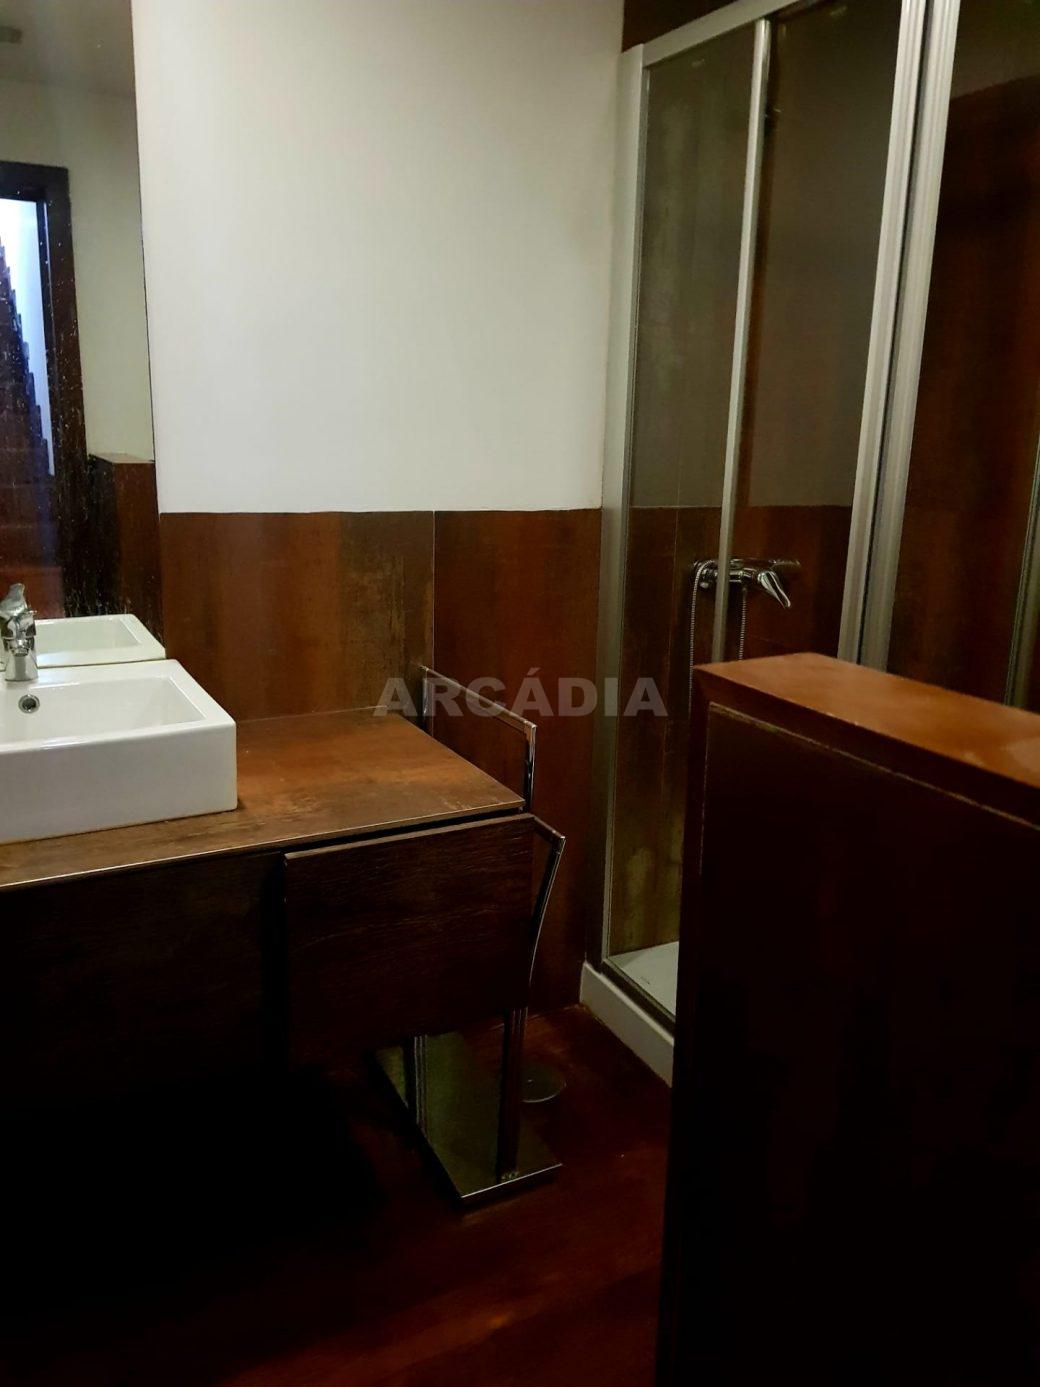 arcadia-imobiliaria-moradia-3665-523